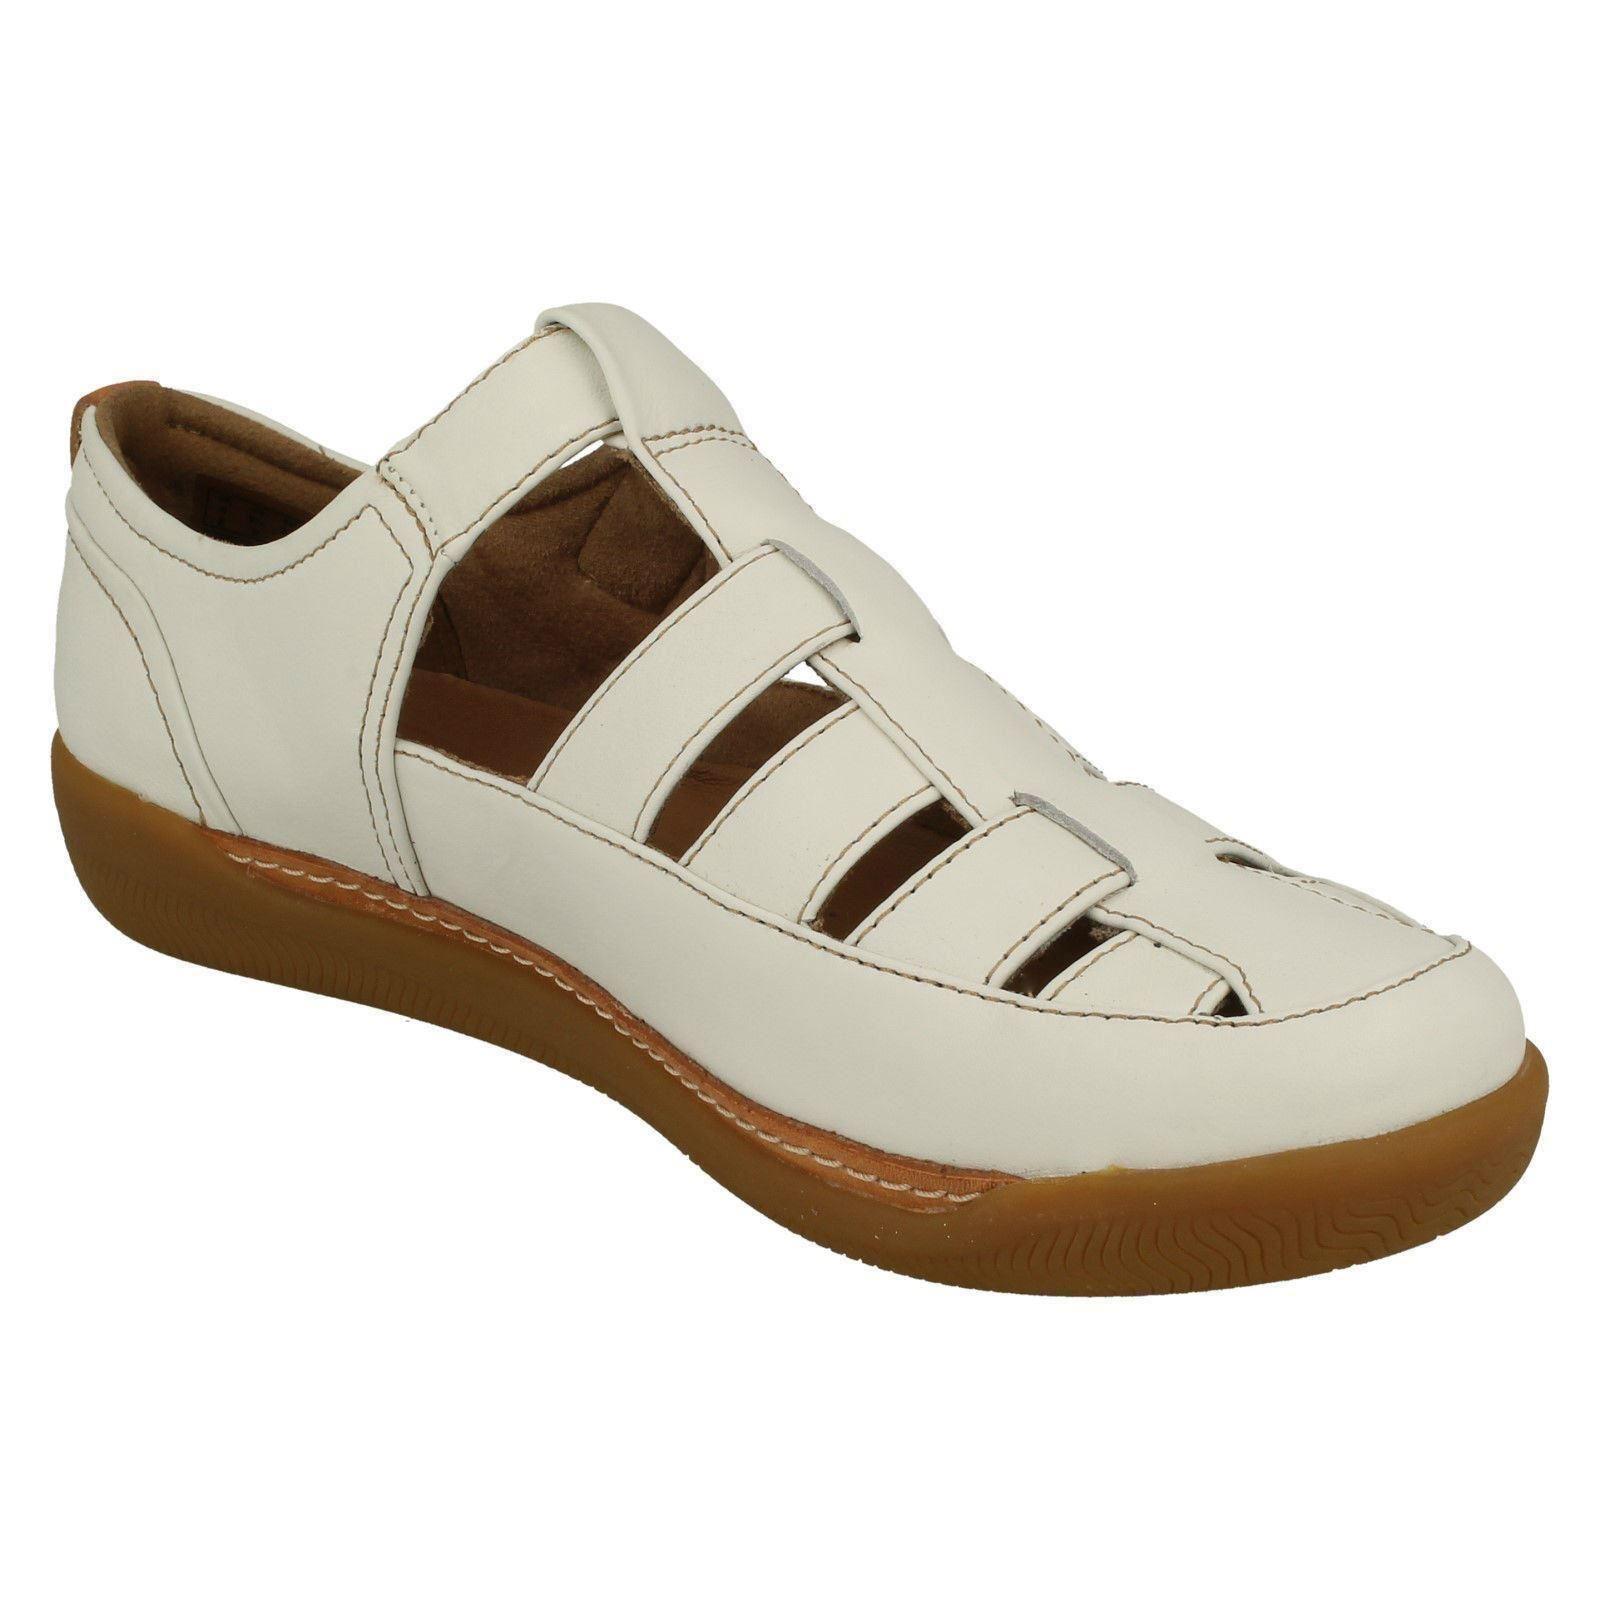 89ccac2a Details about Ladies Clarks Unstructured Casual Shoes Un Haven Cove